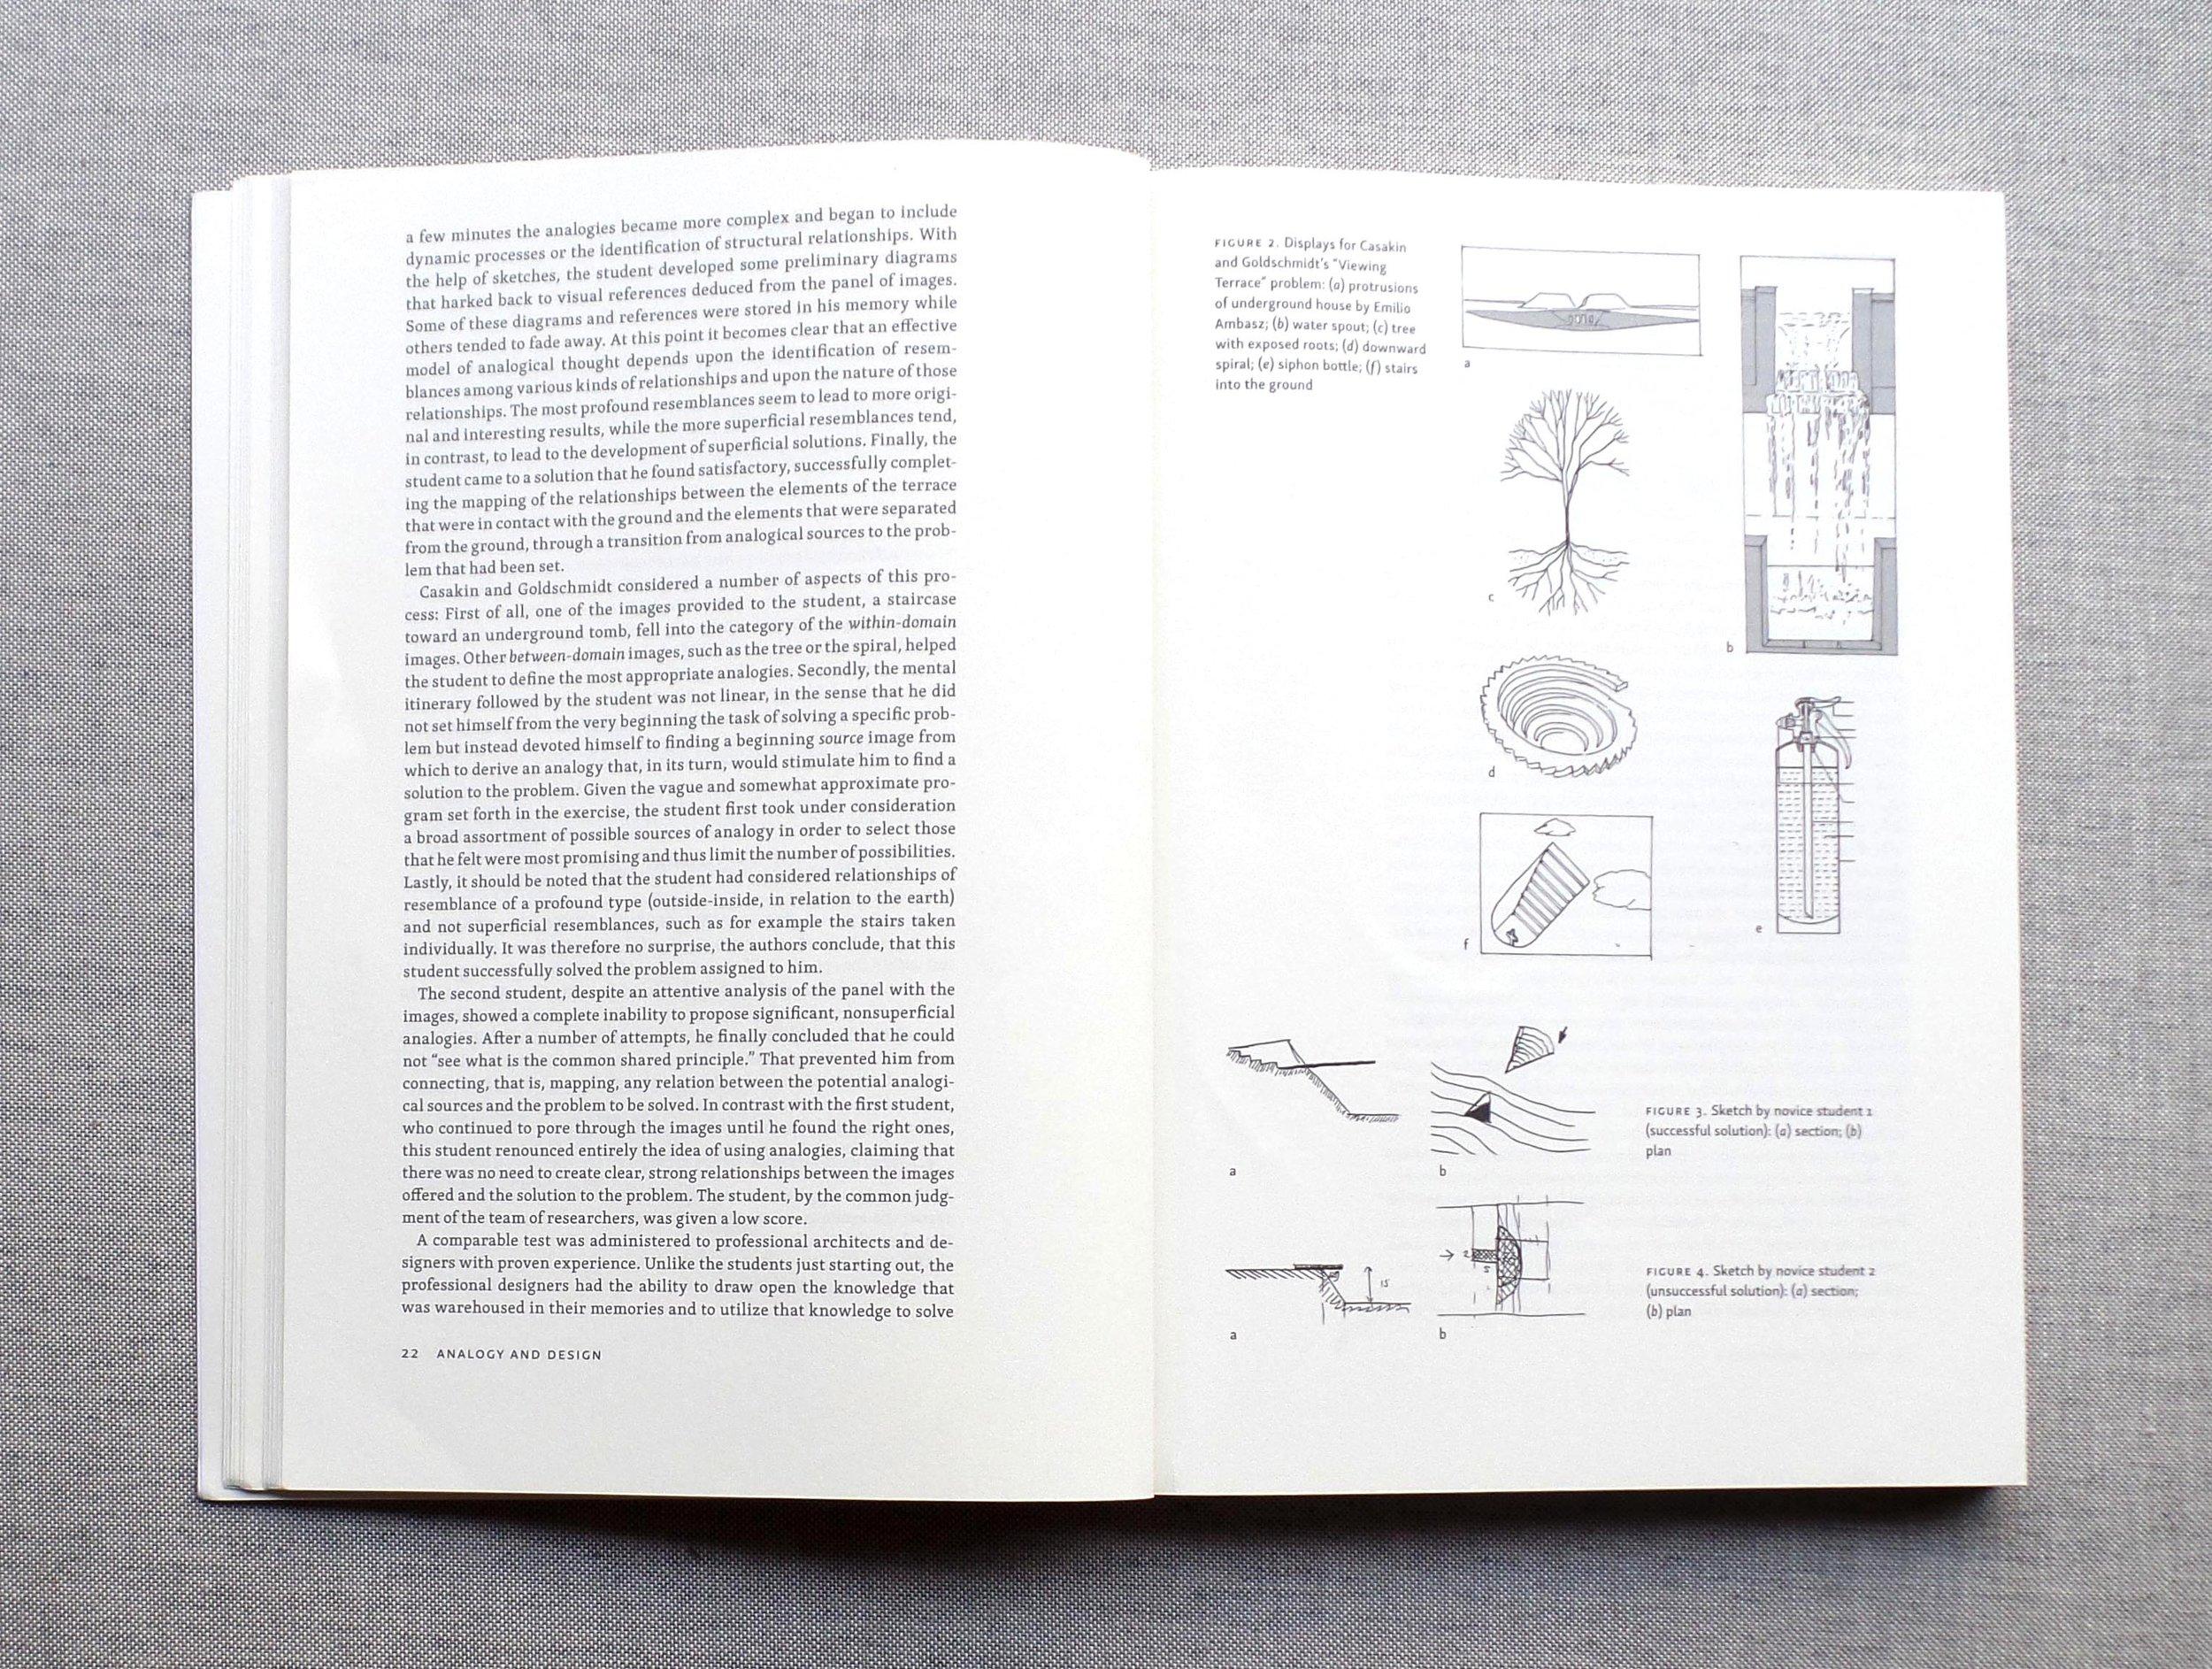 Ponsi - Analogy & Design_SPREAD_7.jpg